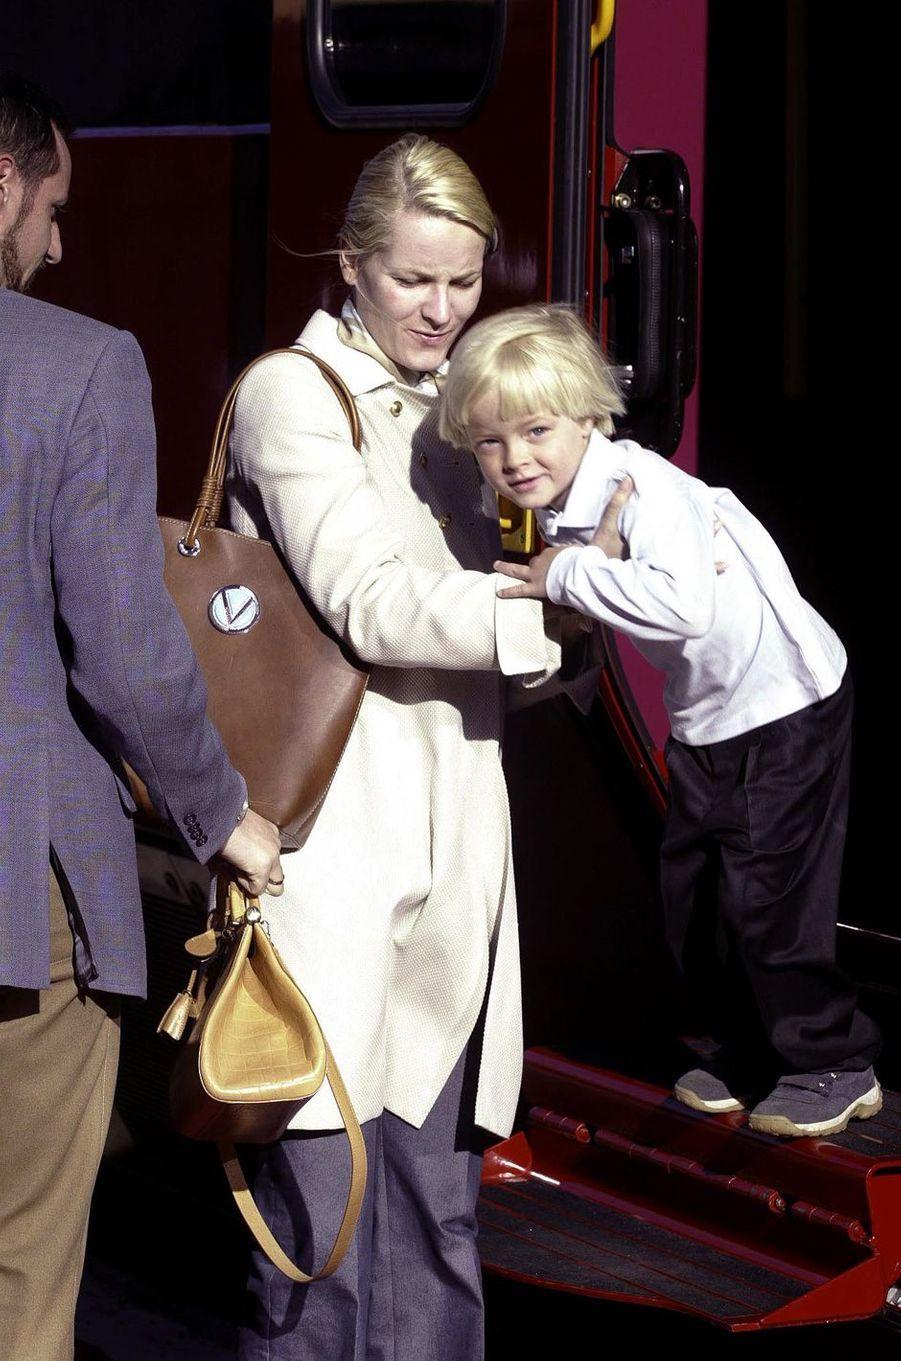 Marius Borg Hoiby, le 25 mai 2002